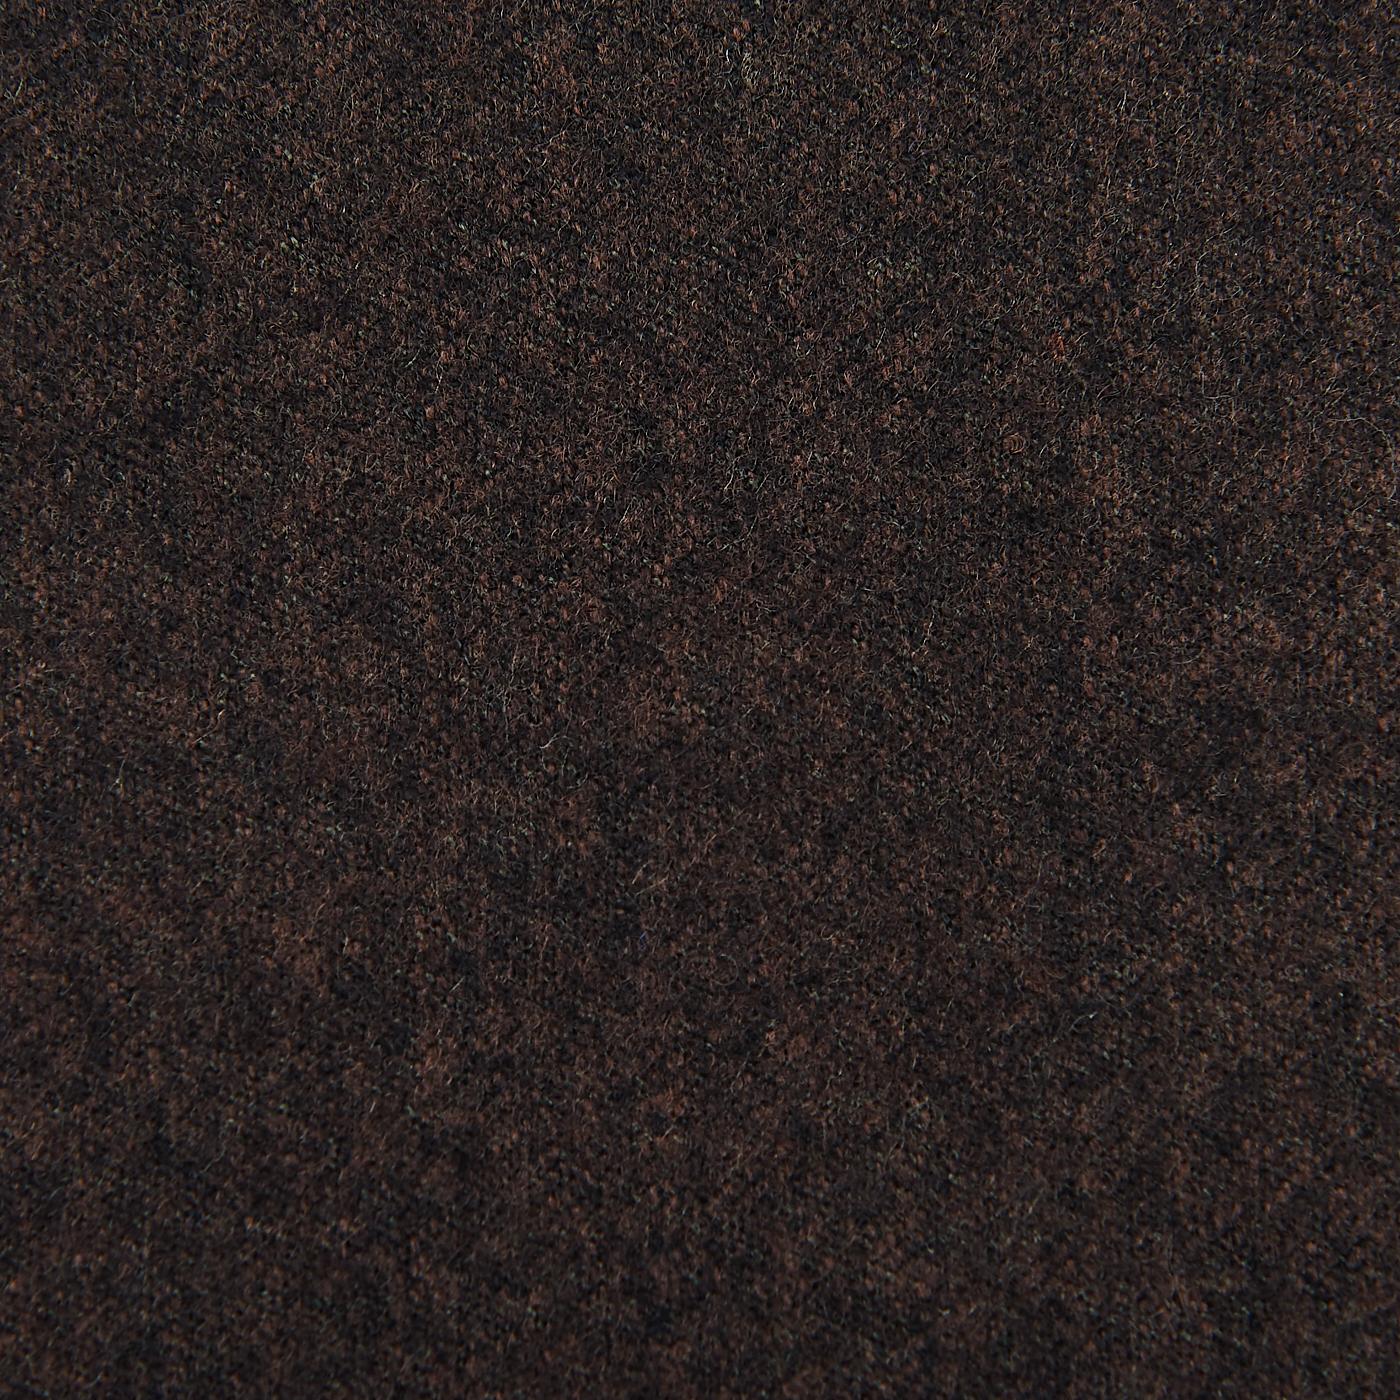 Studio 73 Brown Wool Flannel Pleated Gurkha Trousers Fabric